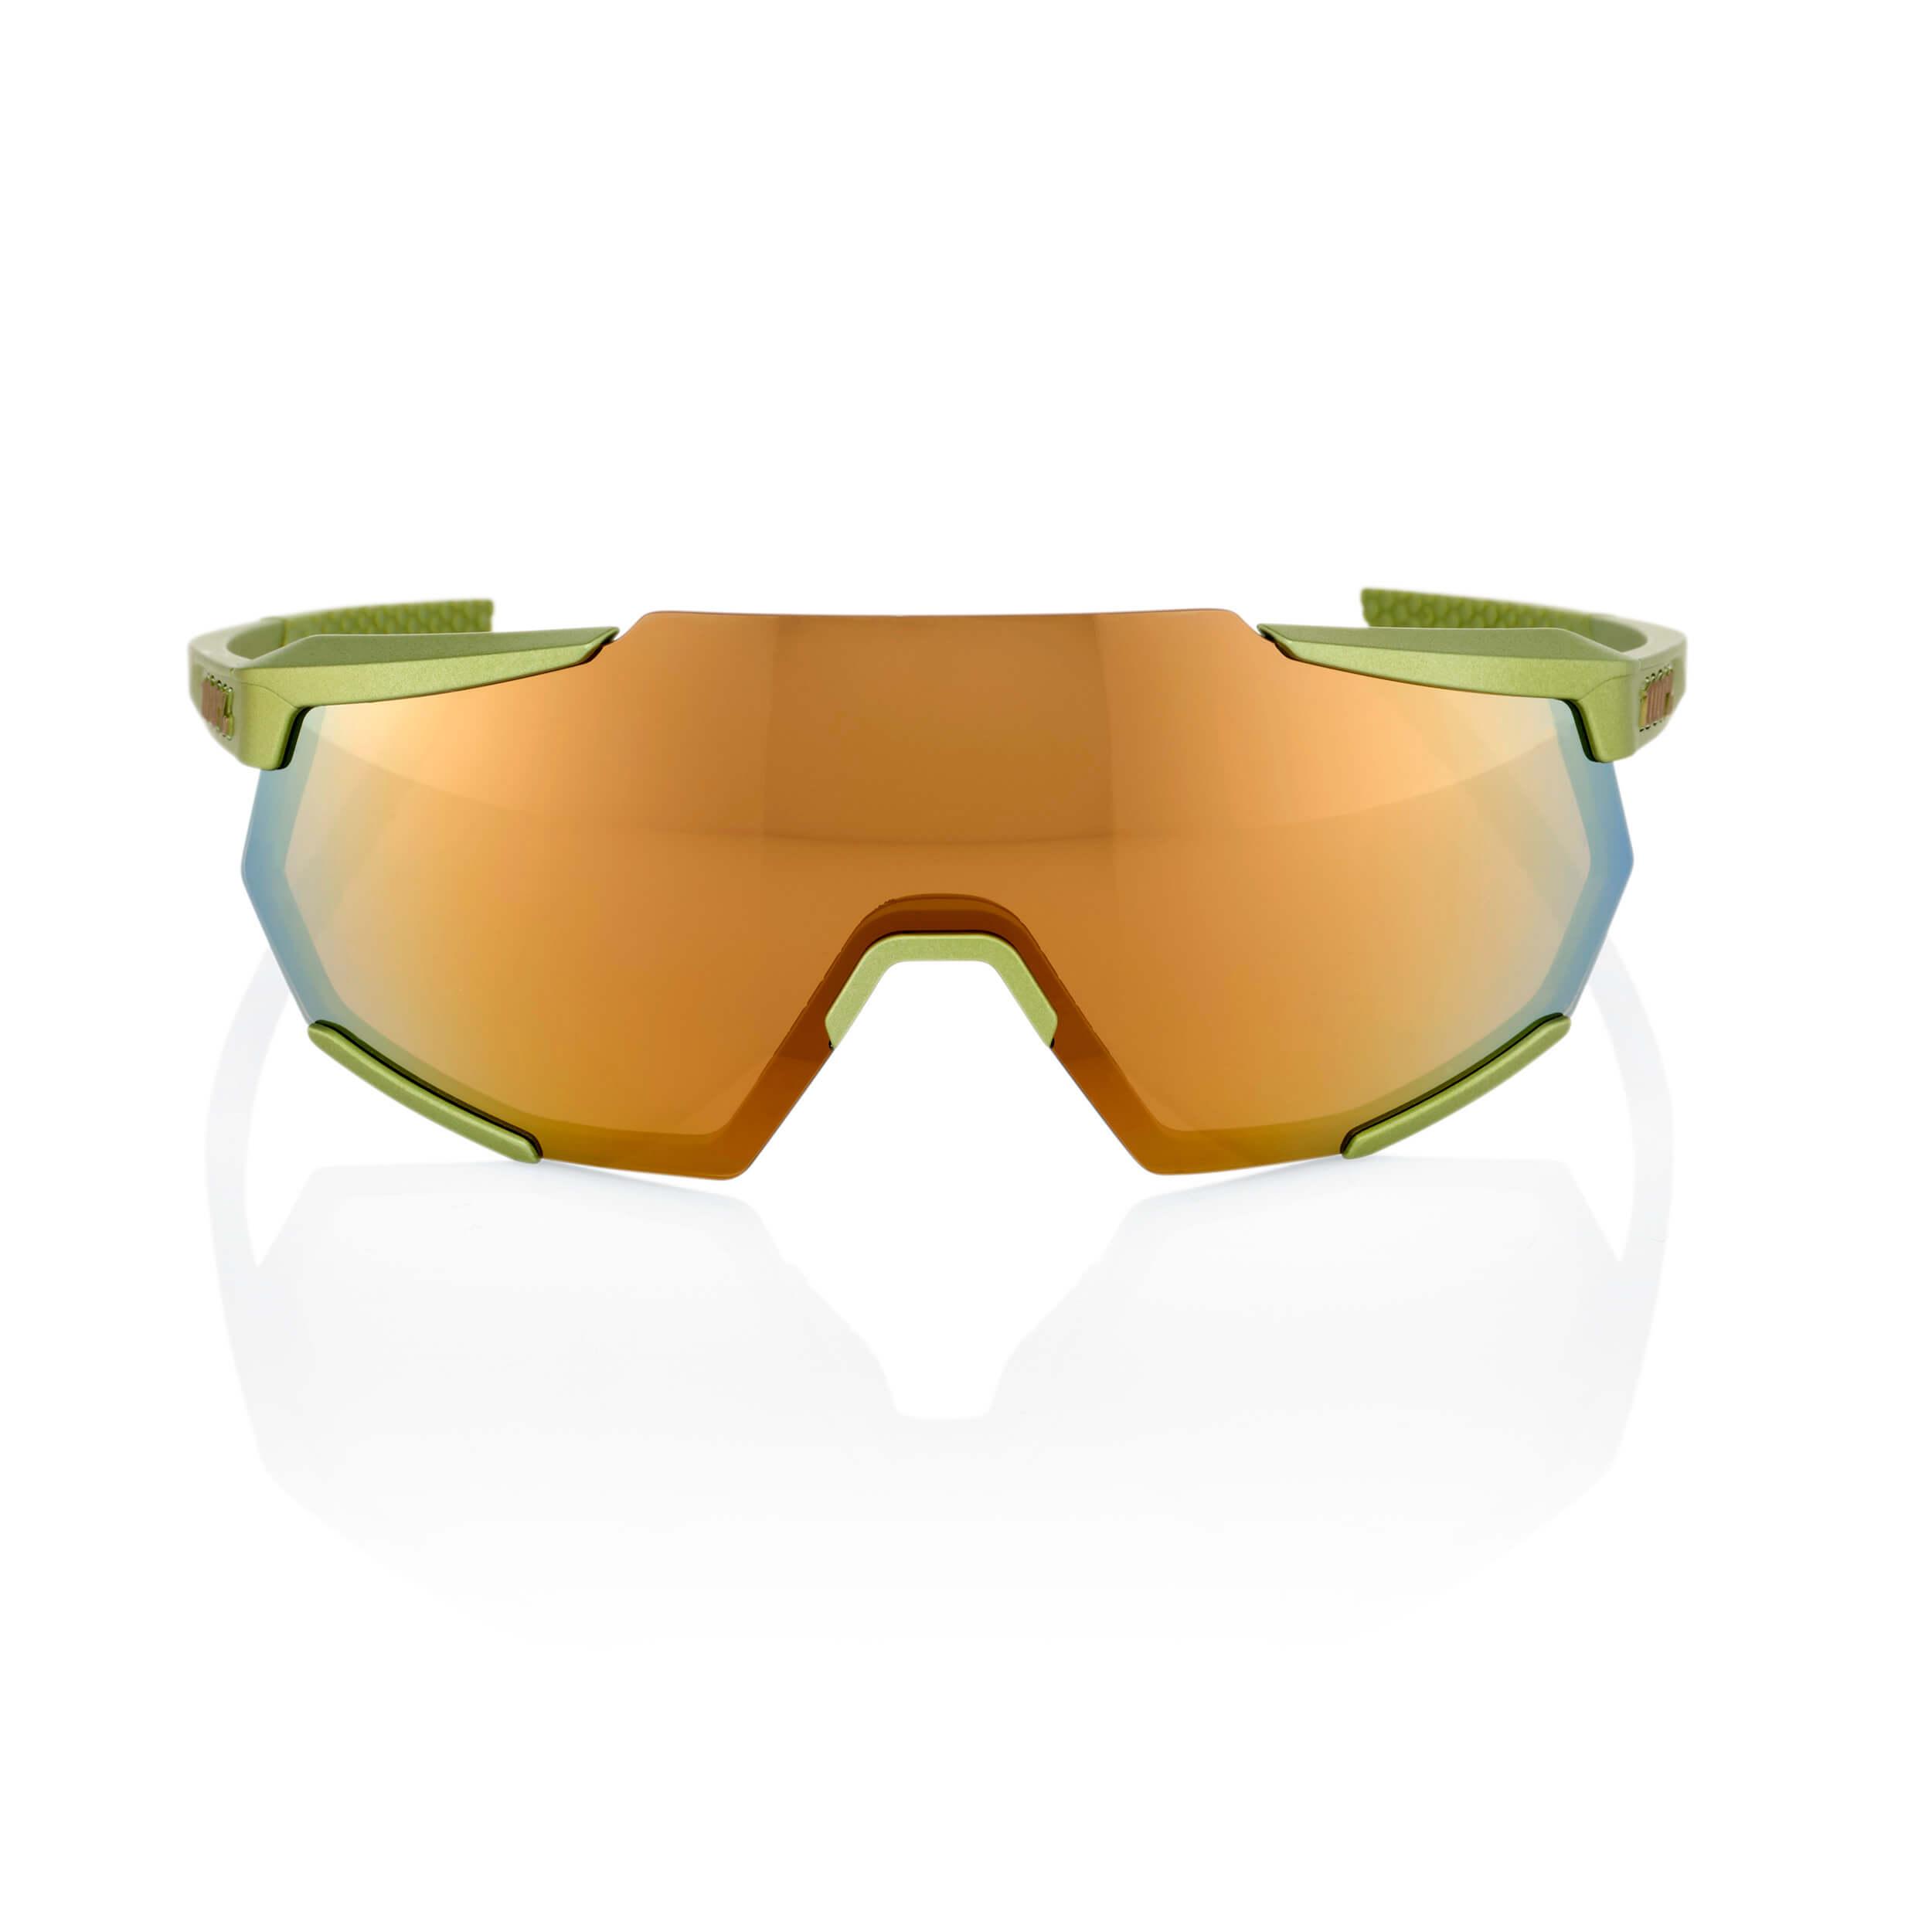 RACETRAP – Matte Metallic Viperidae – Bronze Multilayer Mirror Lens